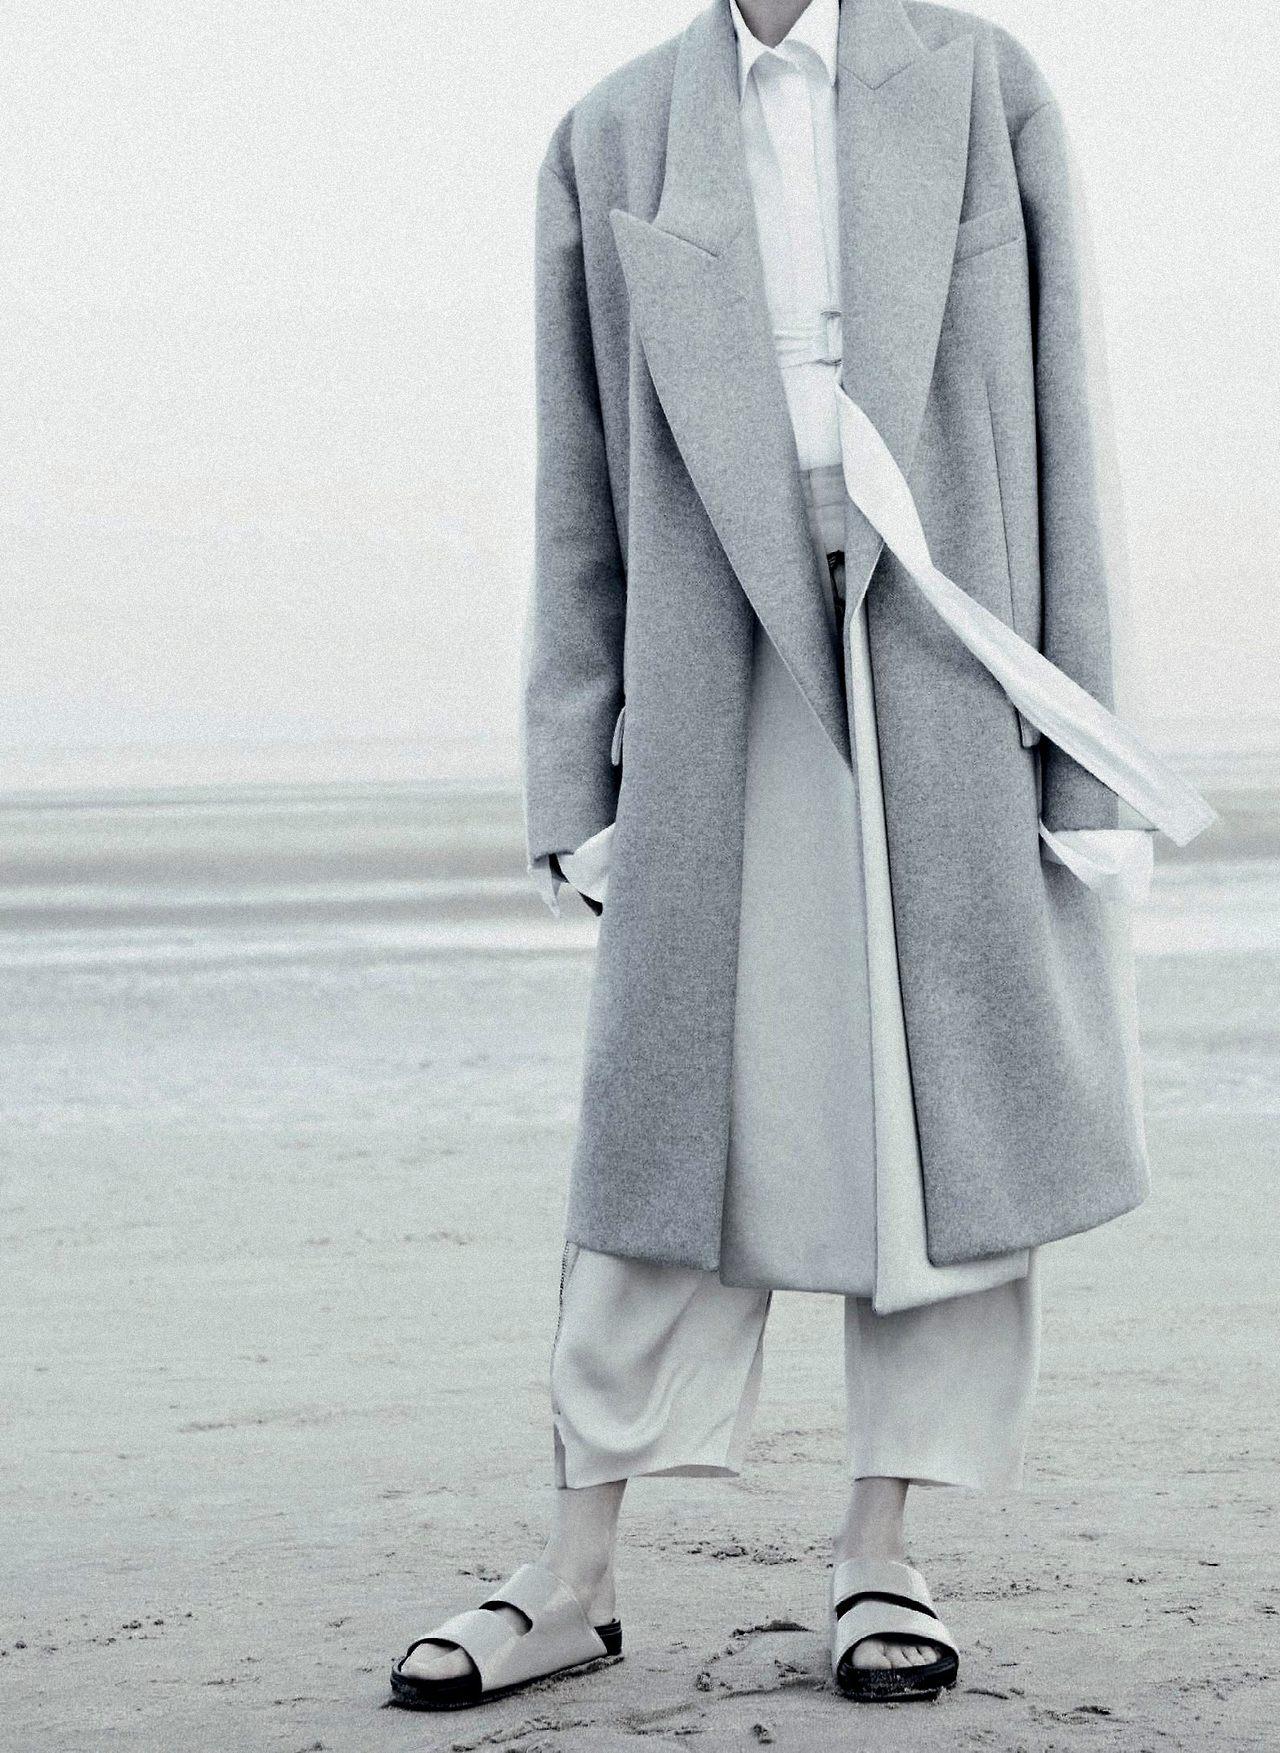 Photographed by Karim Sadli for Vogue Paris November 2013.